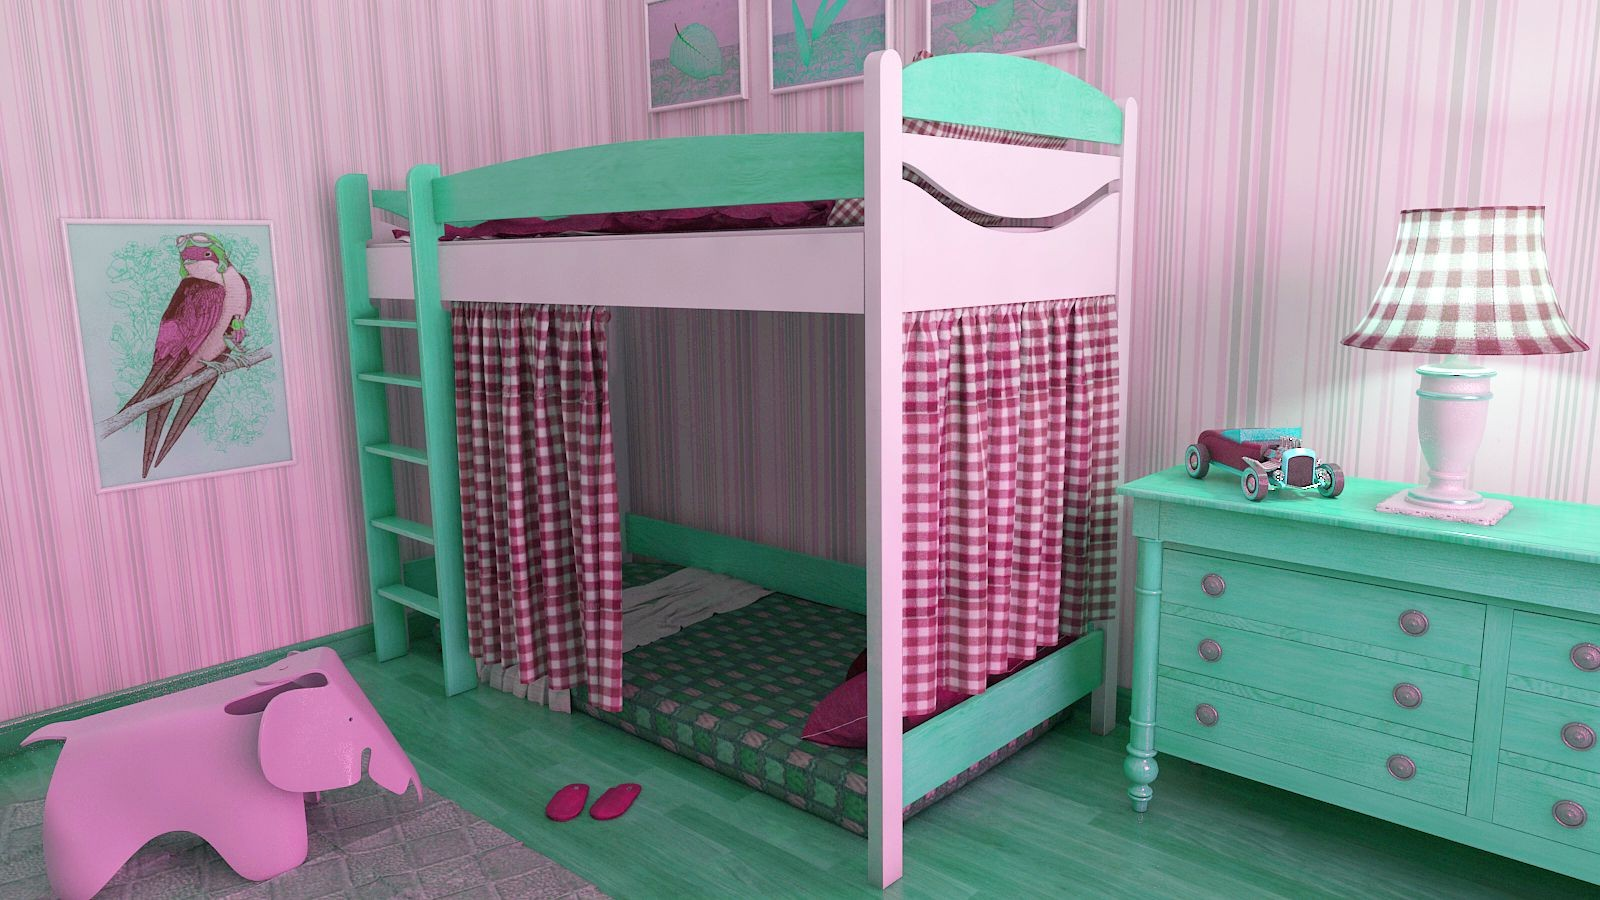 фото дети девочки в кровати